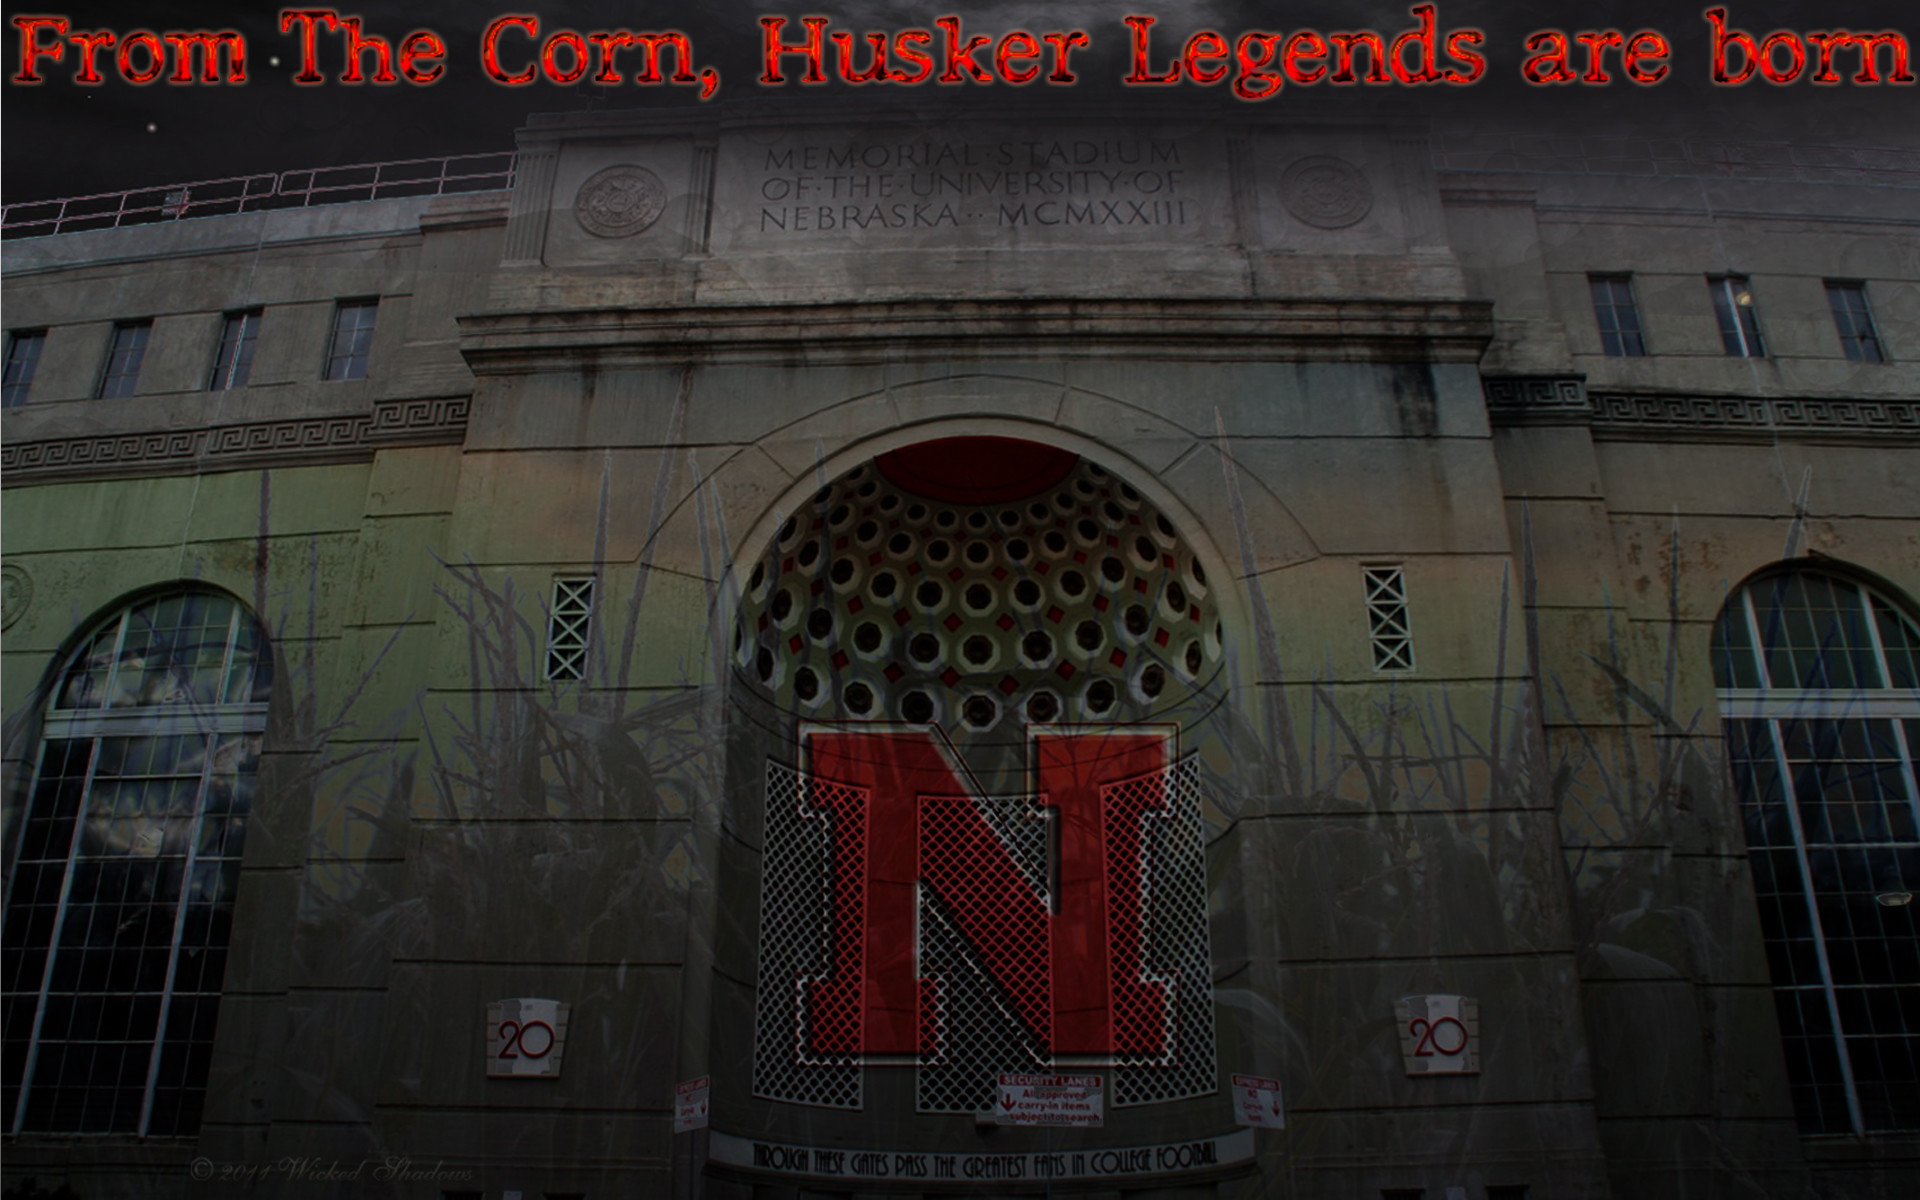 memorial, stadium, nebraska, cornhuskers, wallpaper, legends .